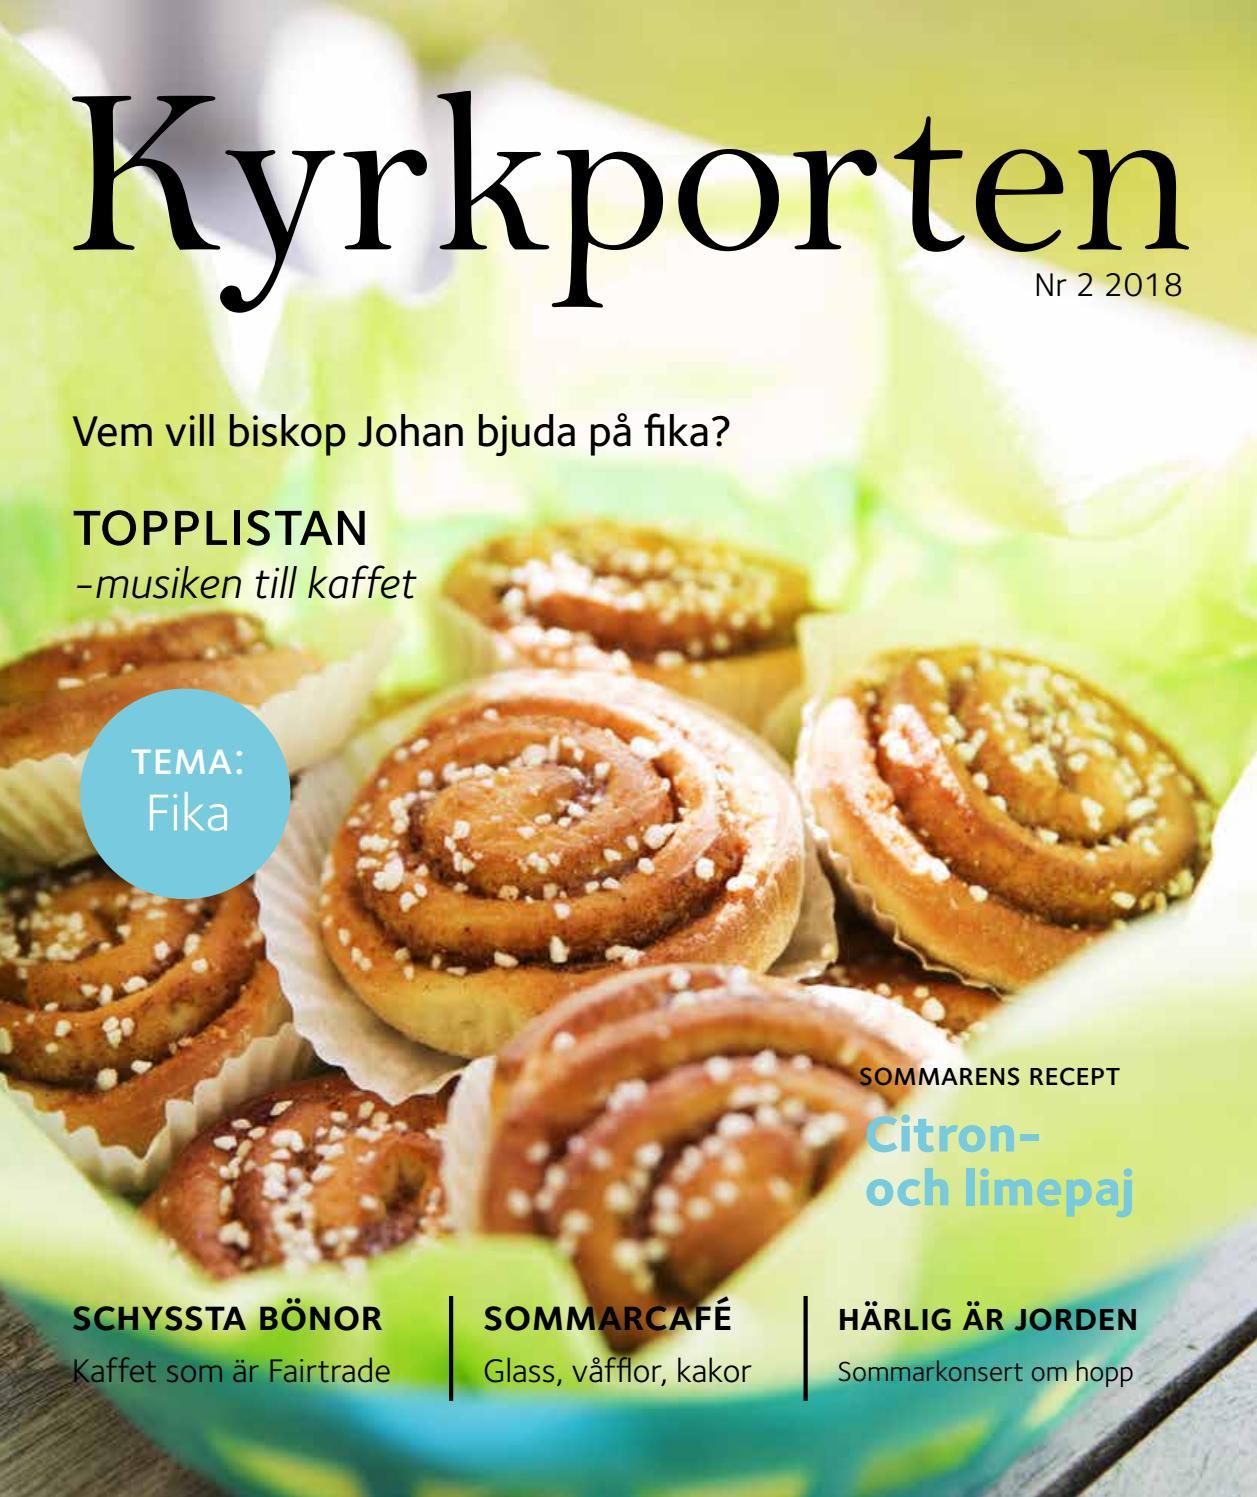 Kornellgatan 16 Skne Ln, Furulund - redteksystems.net